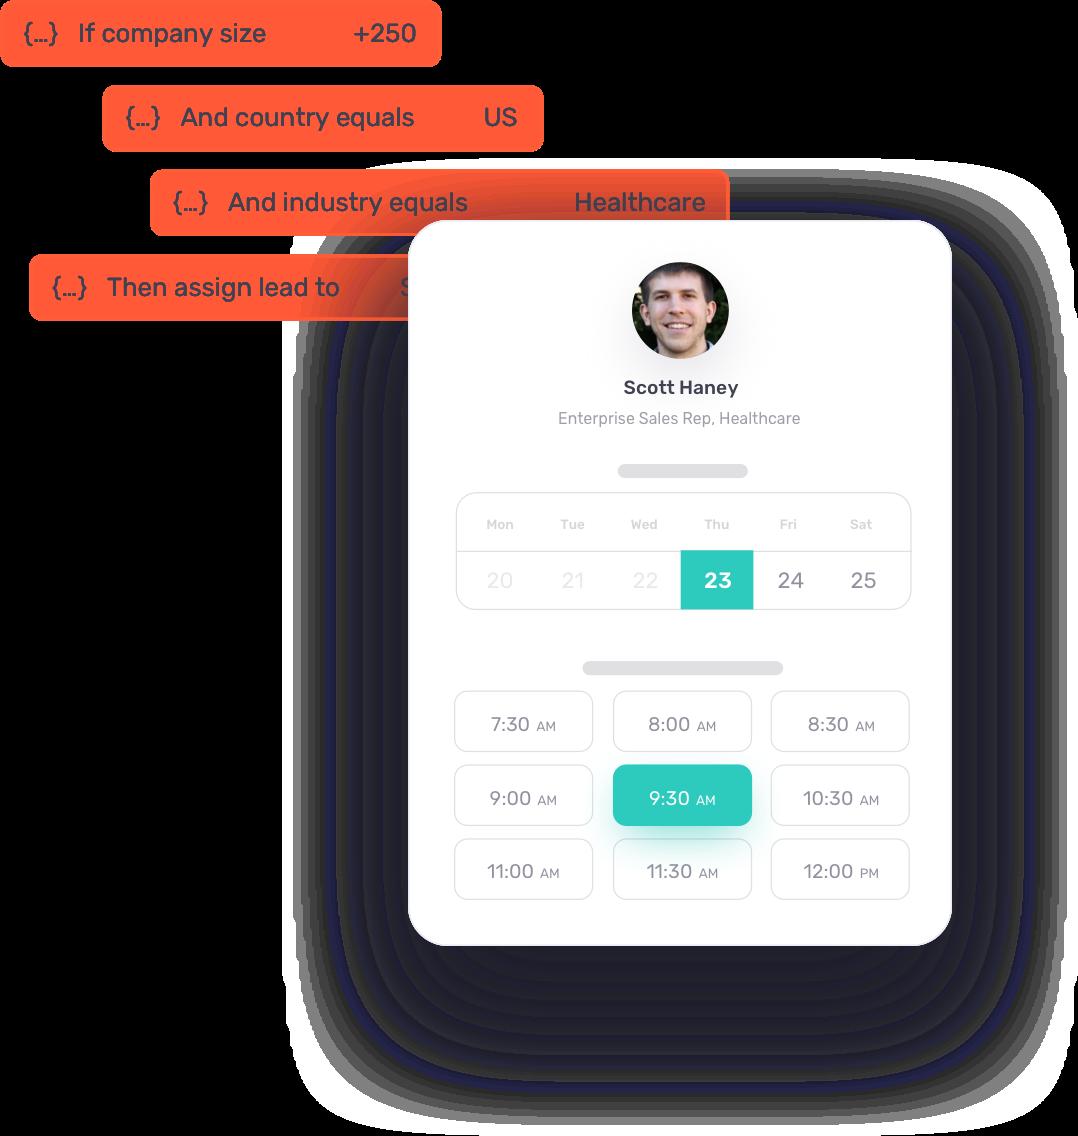 customer engagement company size